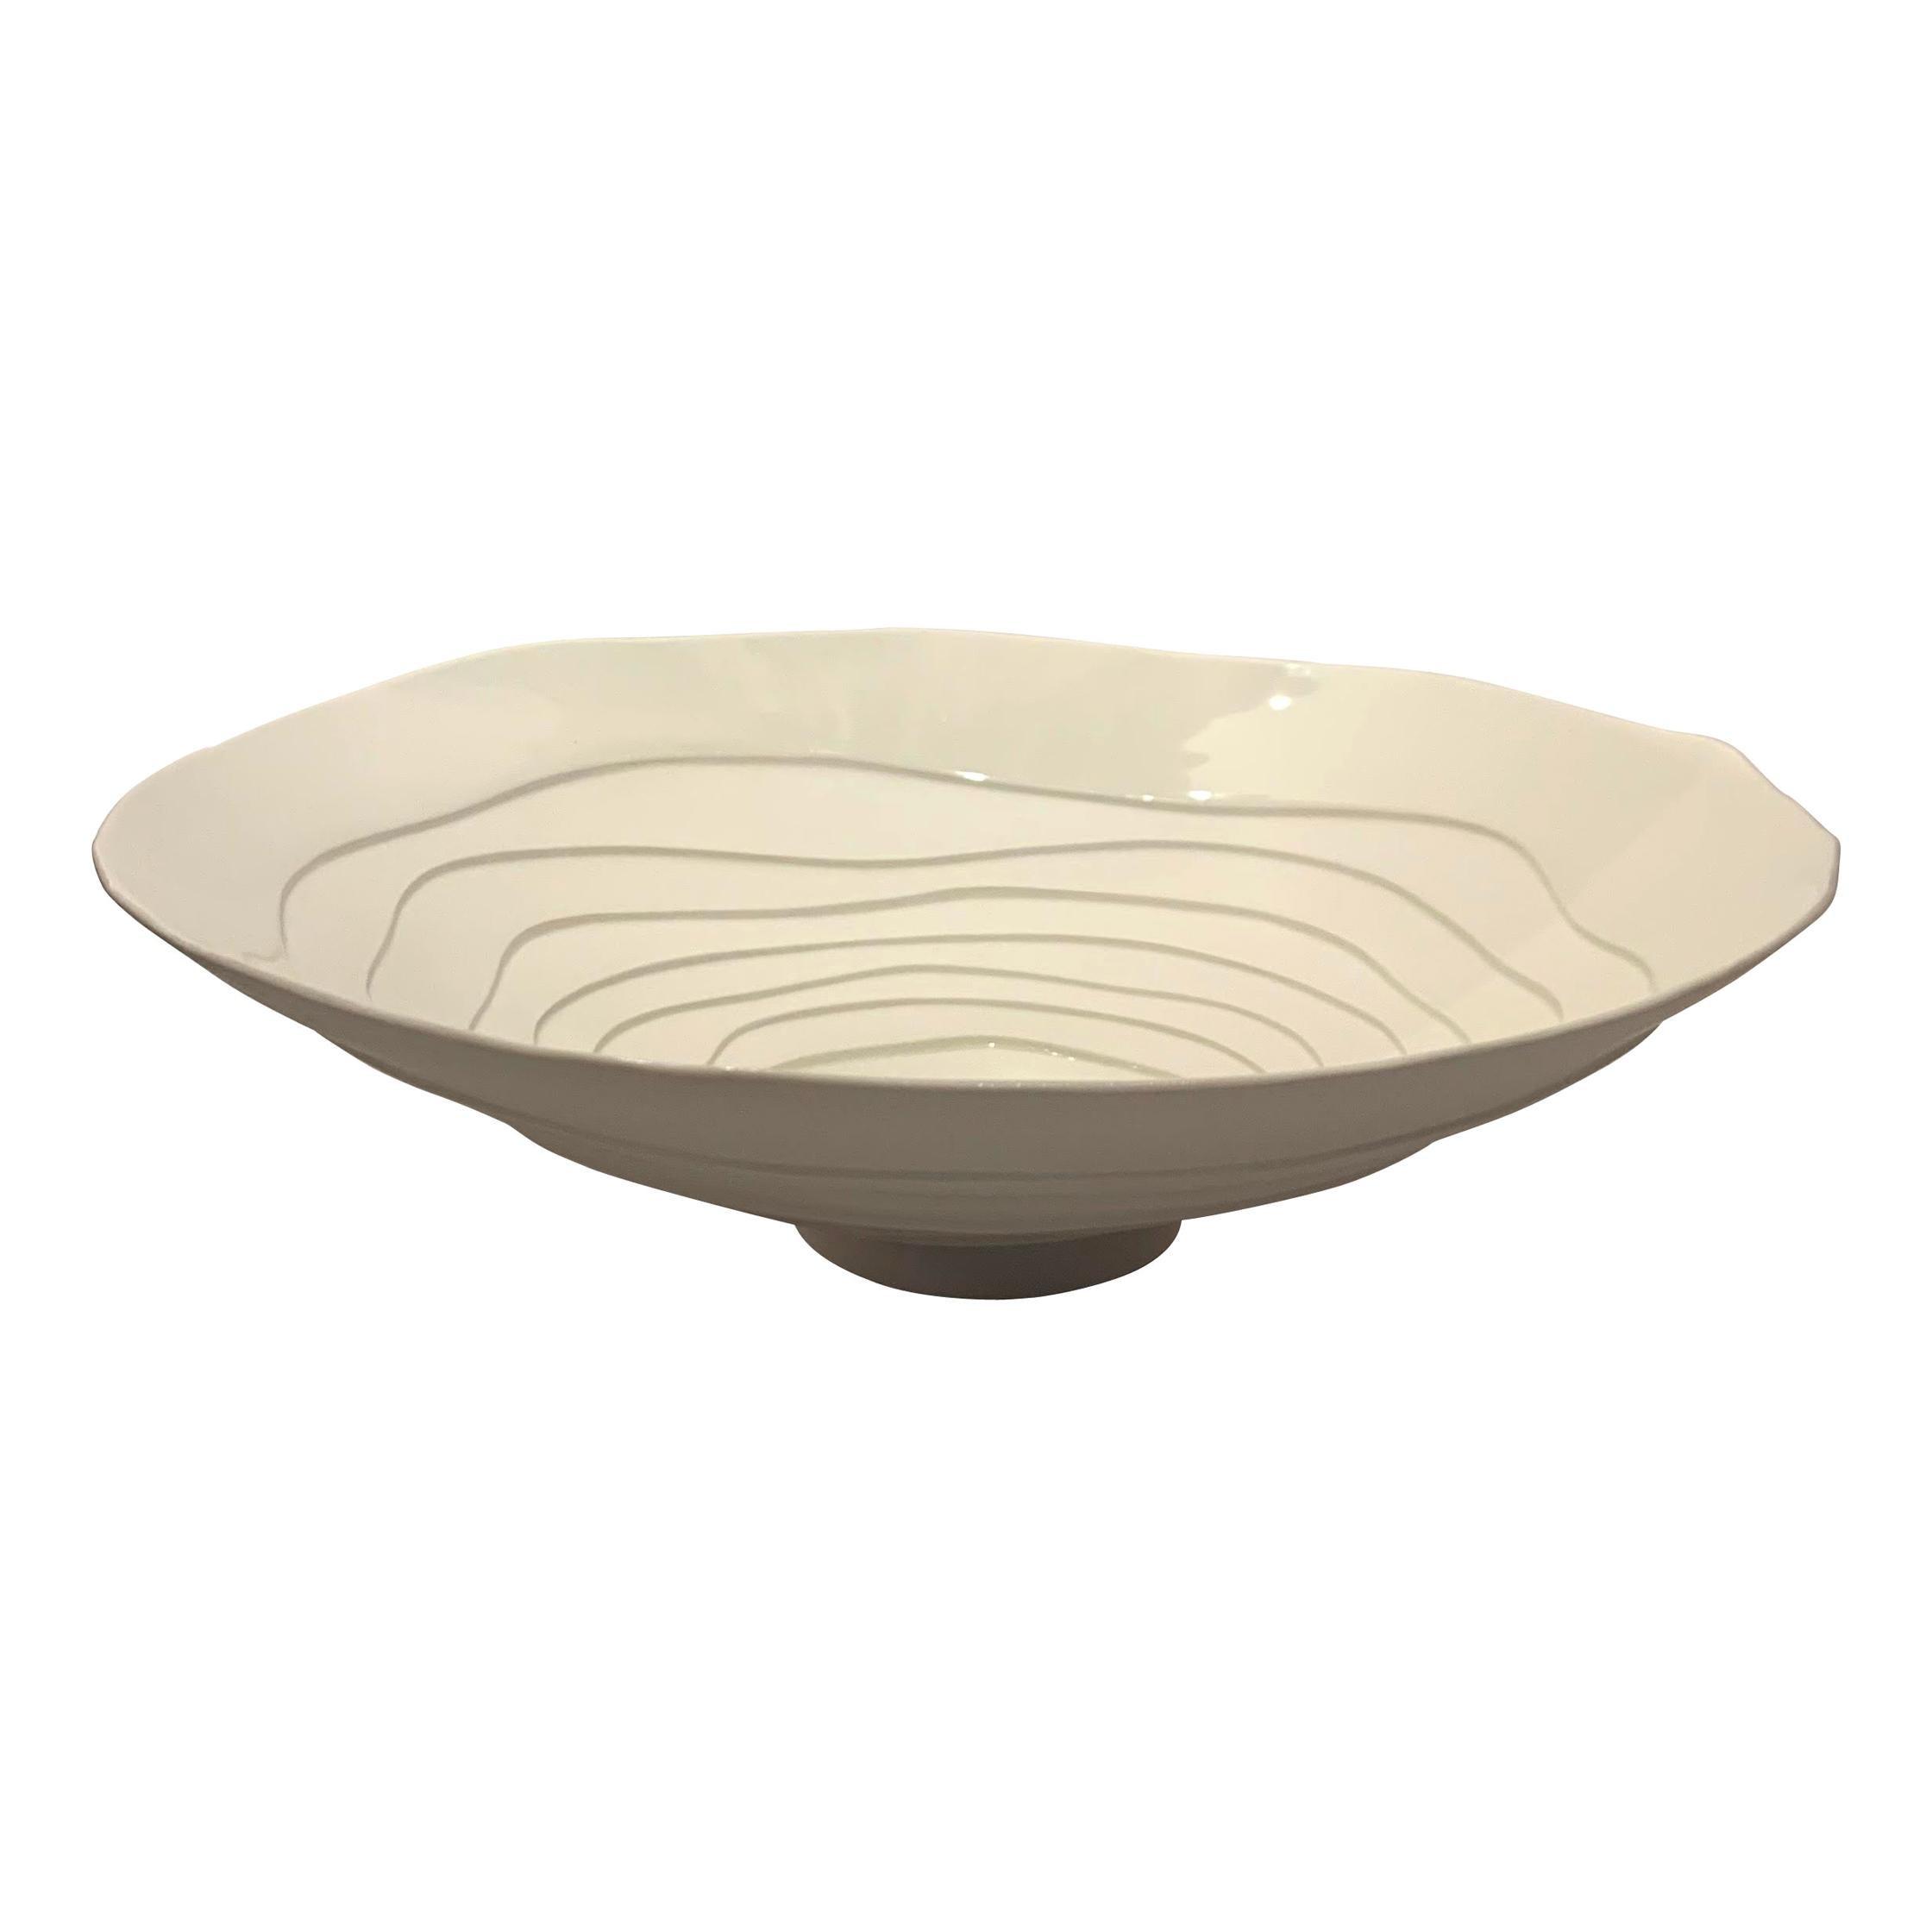 White Porcelain Concentric Circle Design Bowl, Italy, Contemporary